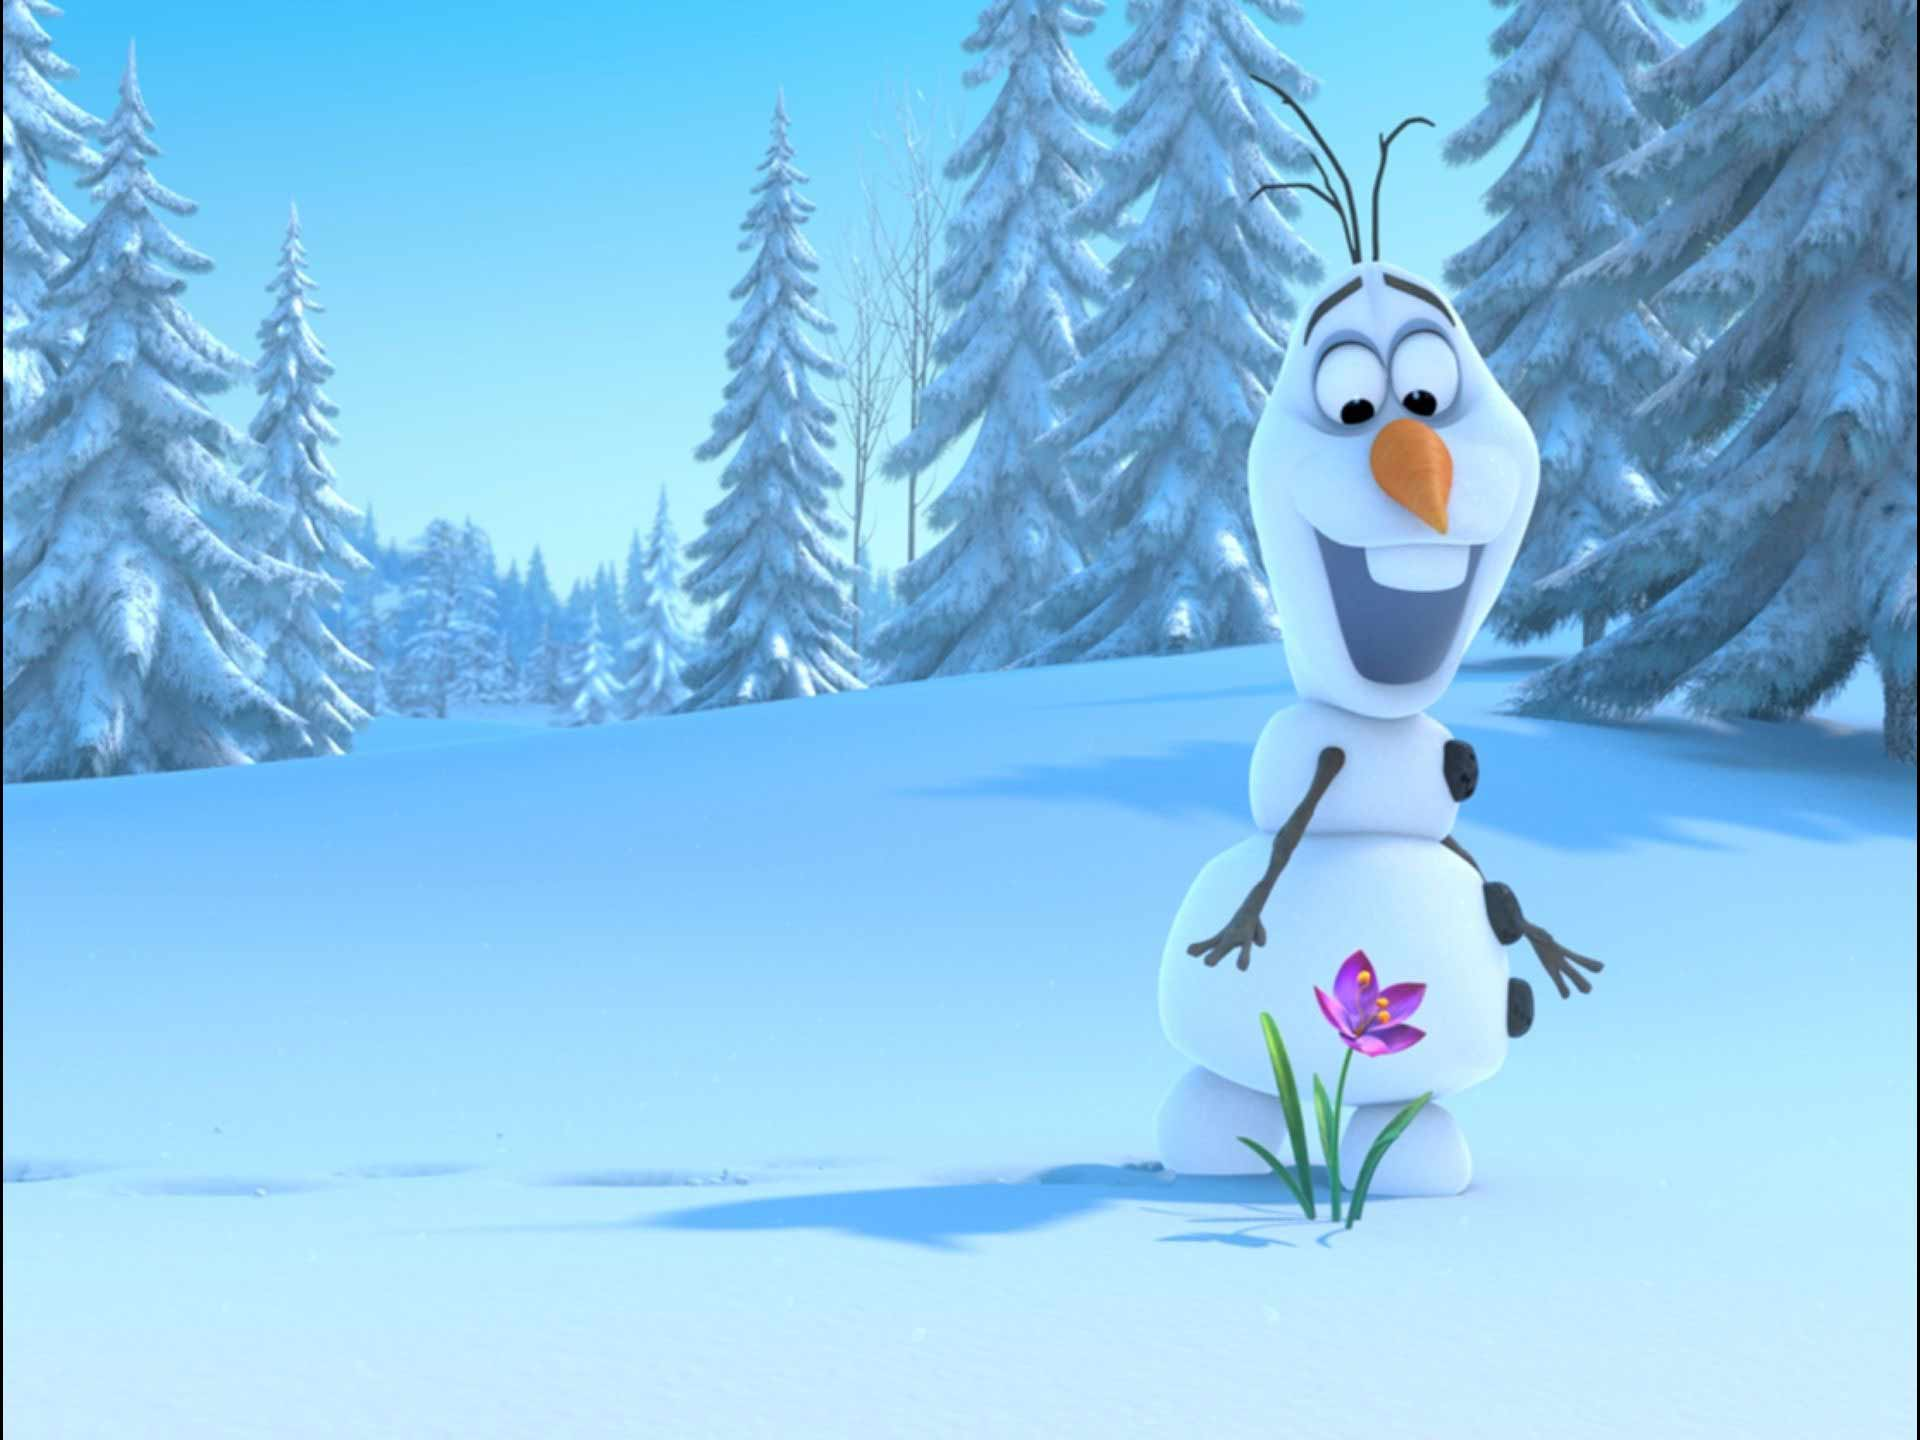 Disney Frozen Wallpapers Desktop Backgrounds HD Frozen Movie 1920x1440